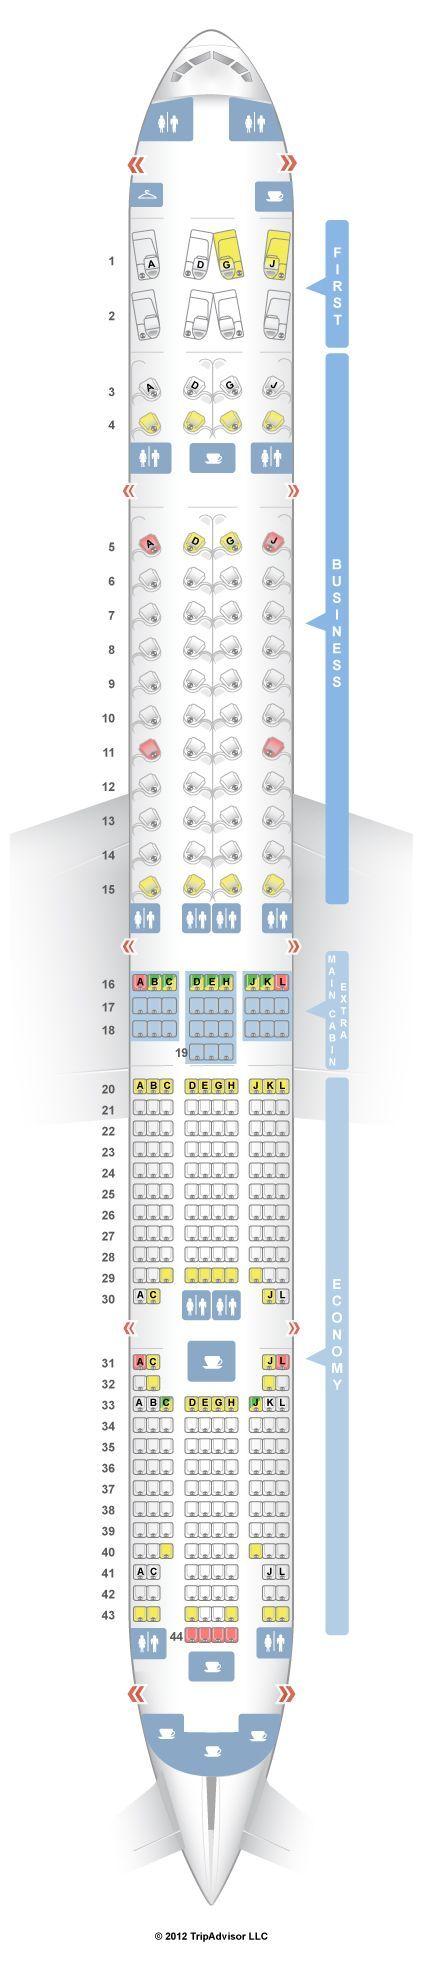 SeatGuru Seat Map American Airlines Boeing 777-300ER (77W):